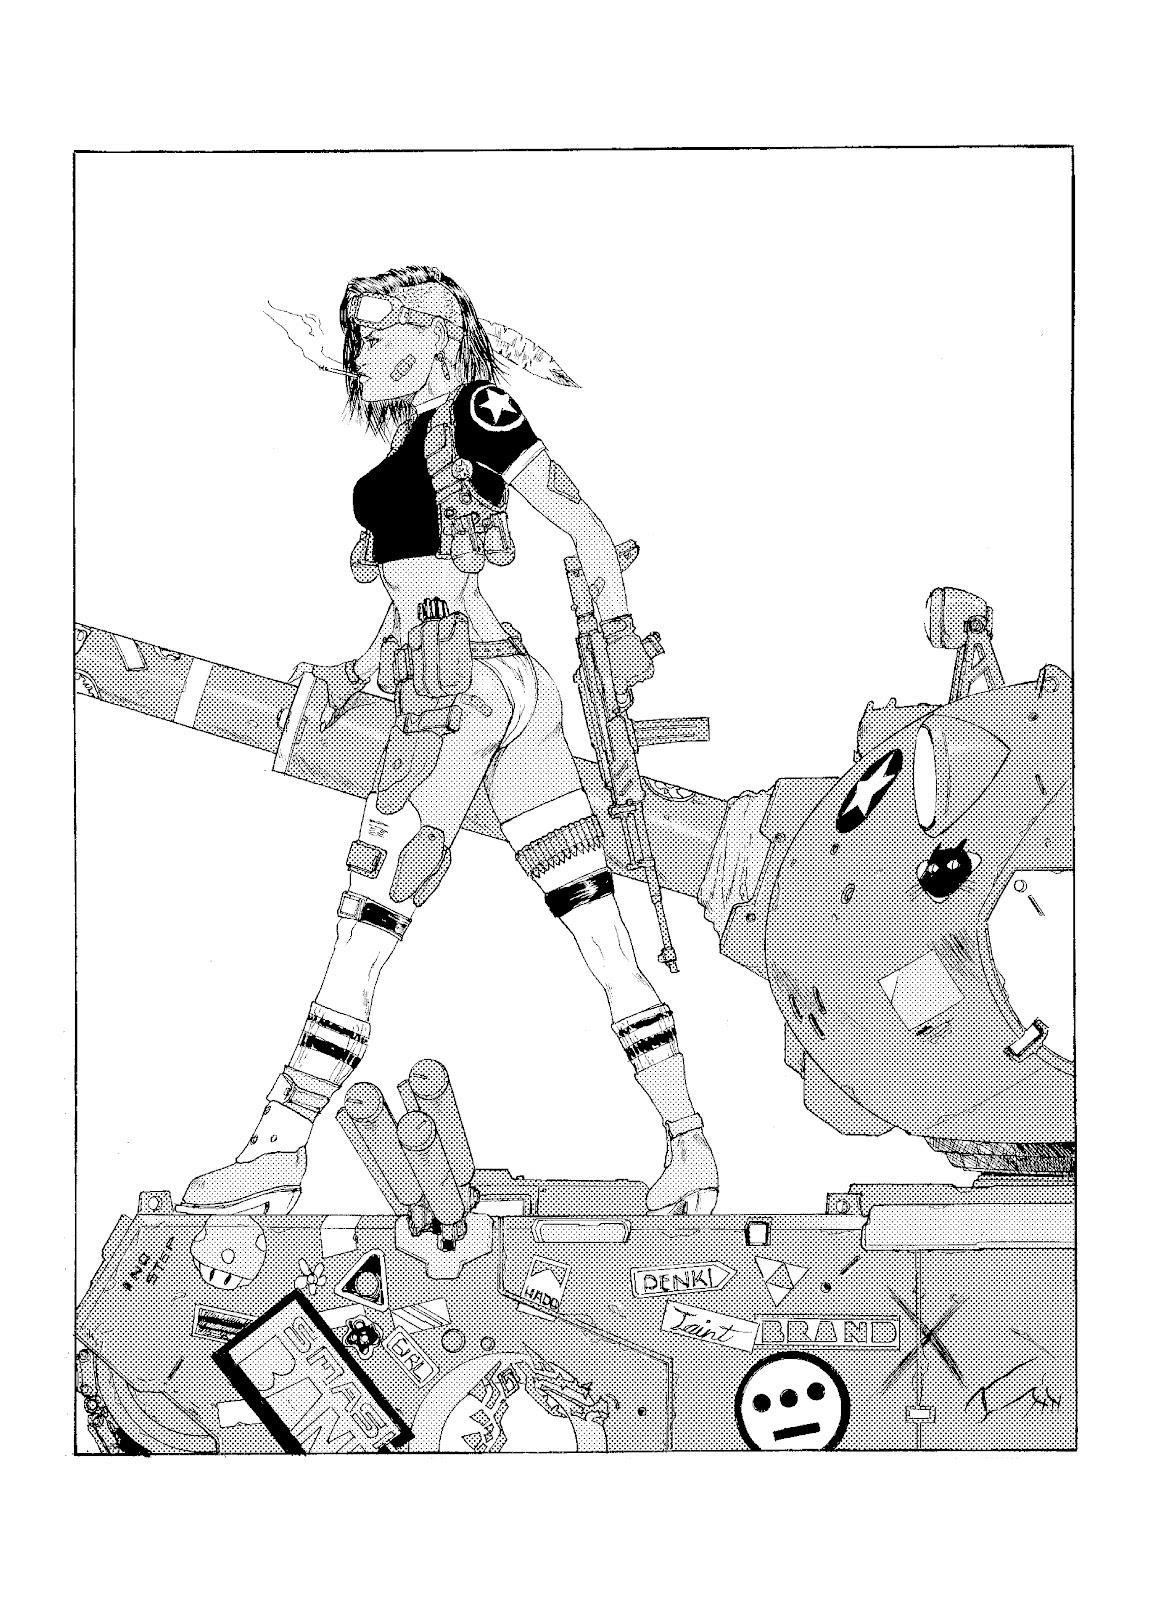 Timberline Draw Blog: Tank girl?